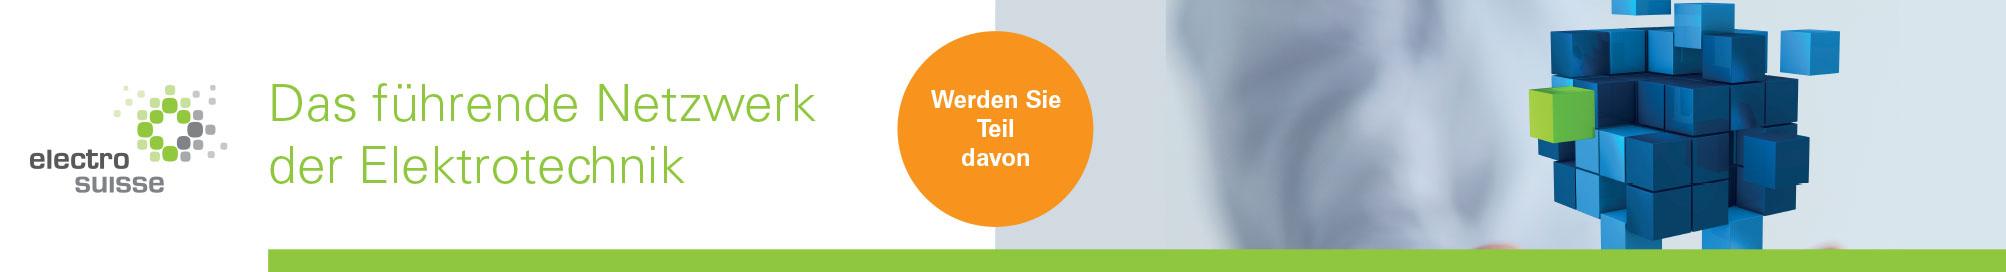 electro suisse Kampagne 2017